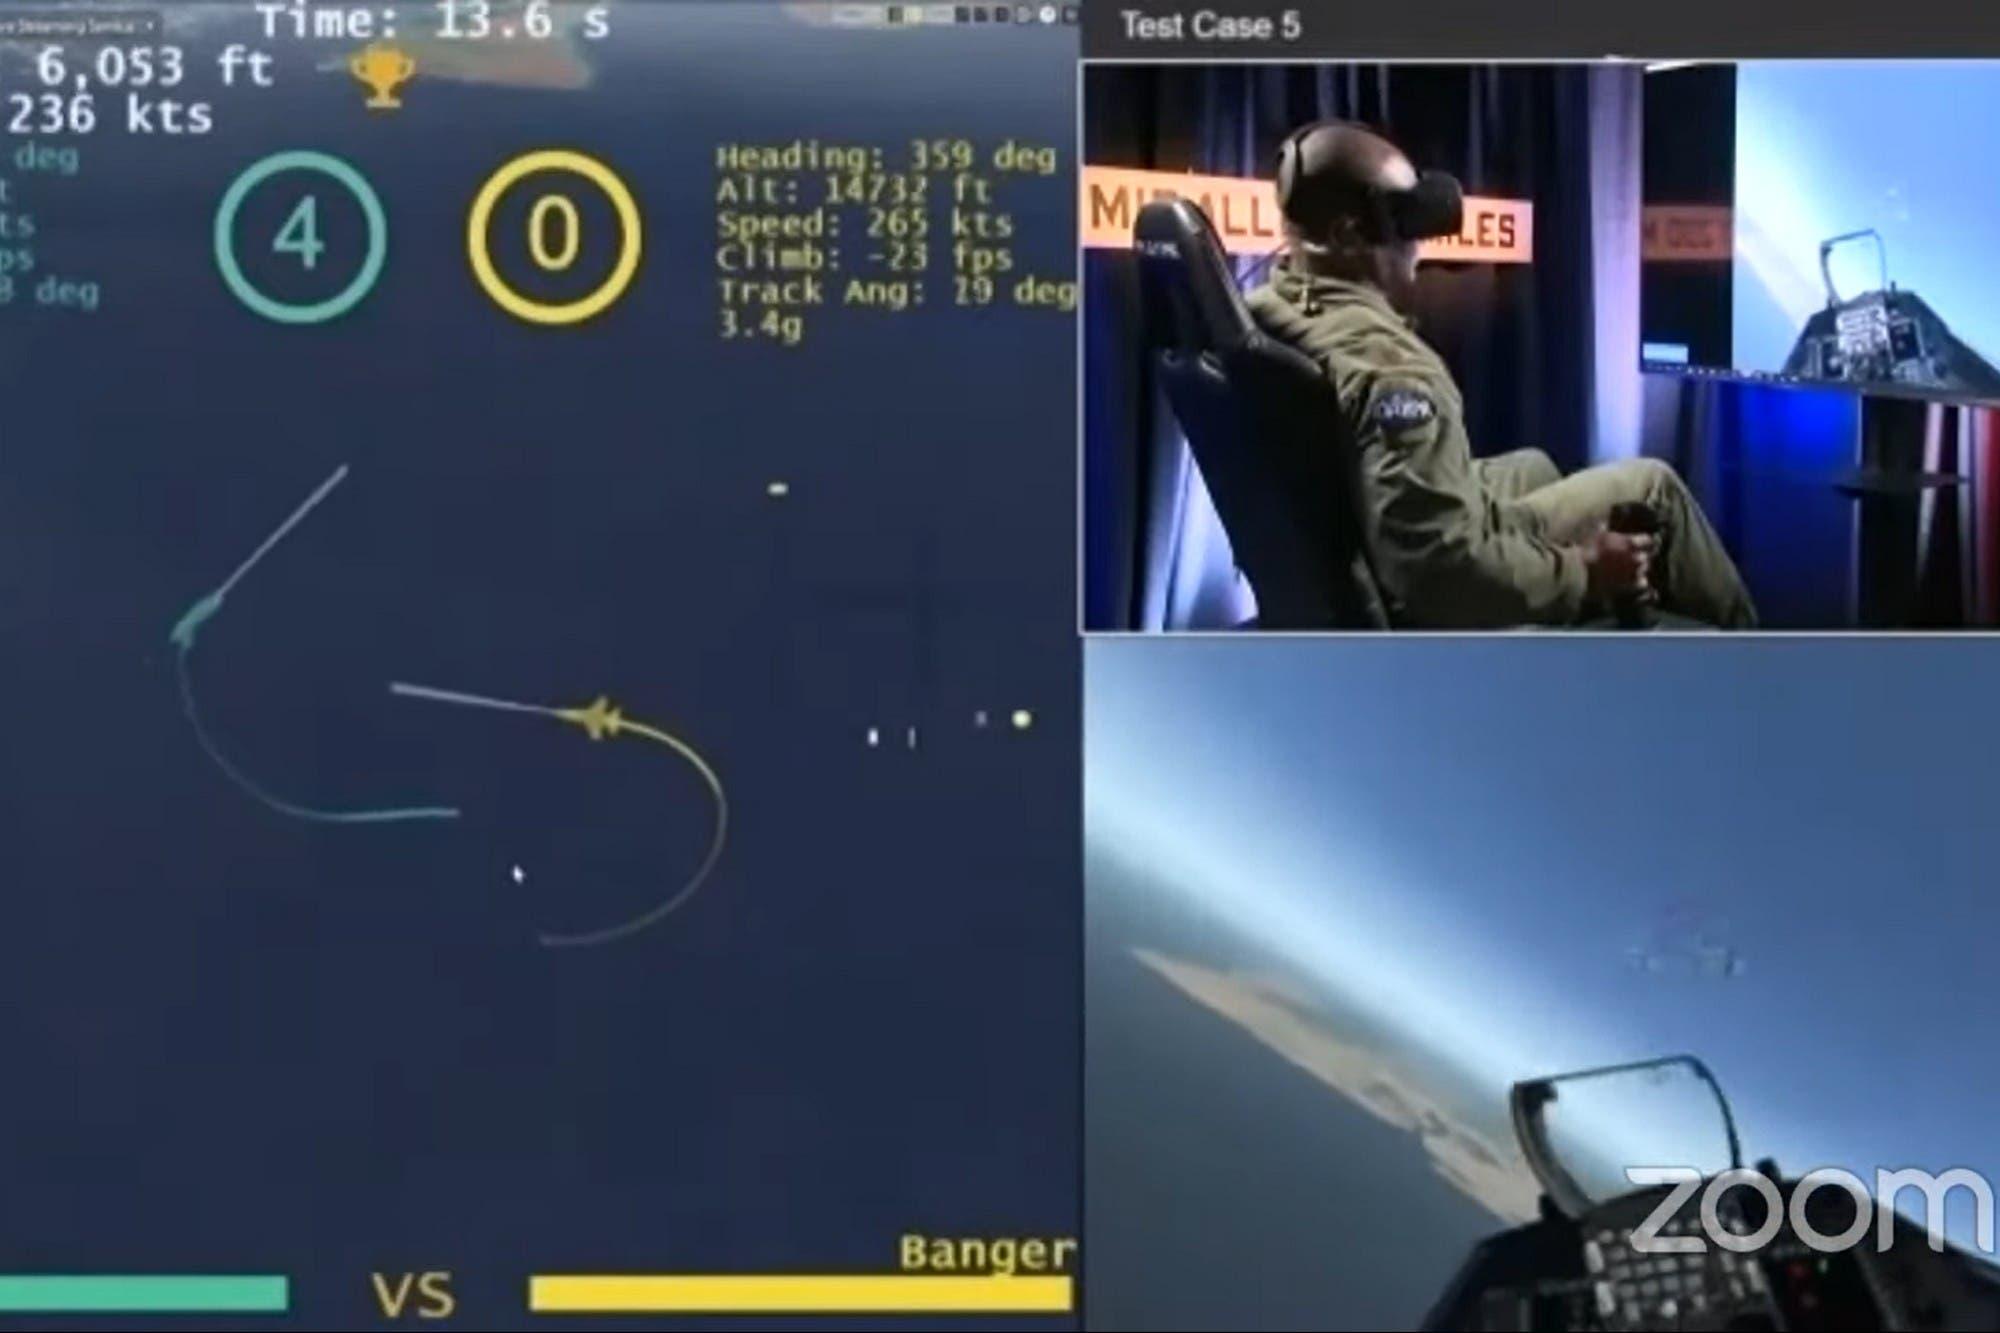 Un sistema de inteligencia artificial venció a un piloto humano de un F-16 en un combate simulado